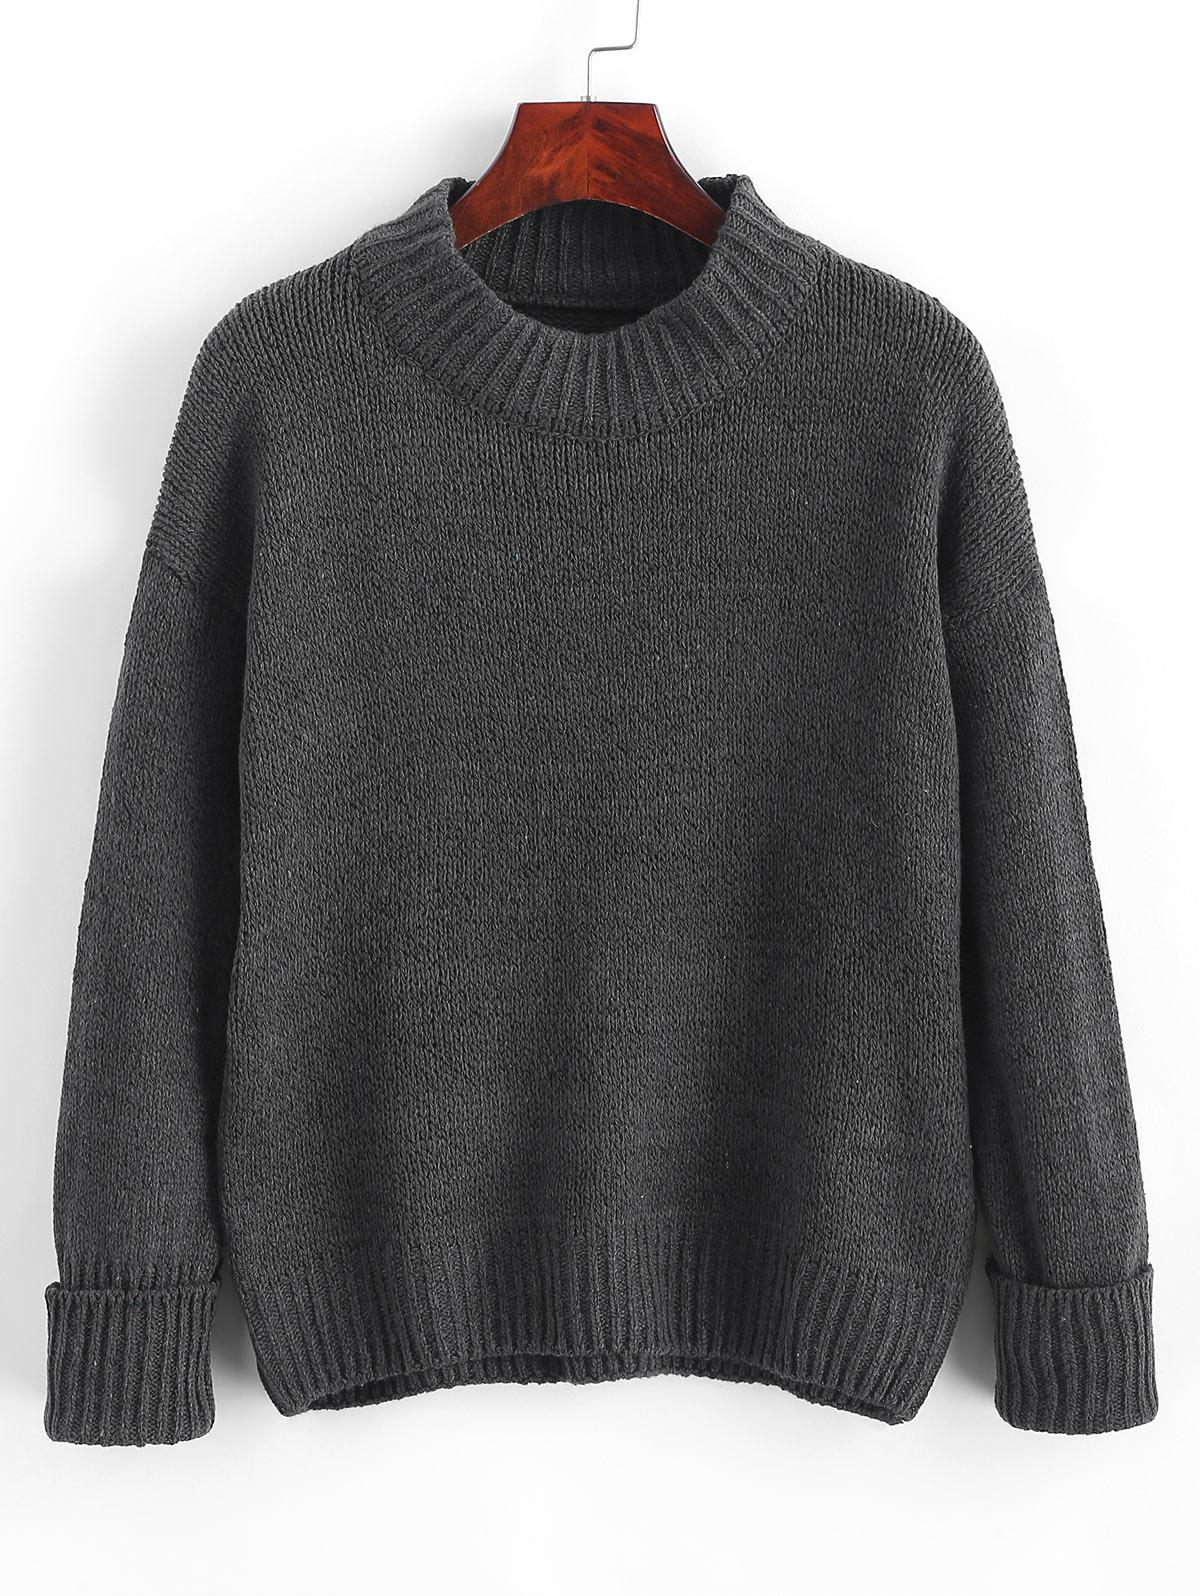 Crew Neck Heathered Loose Sweater